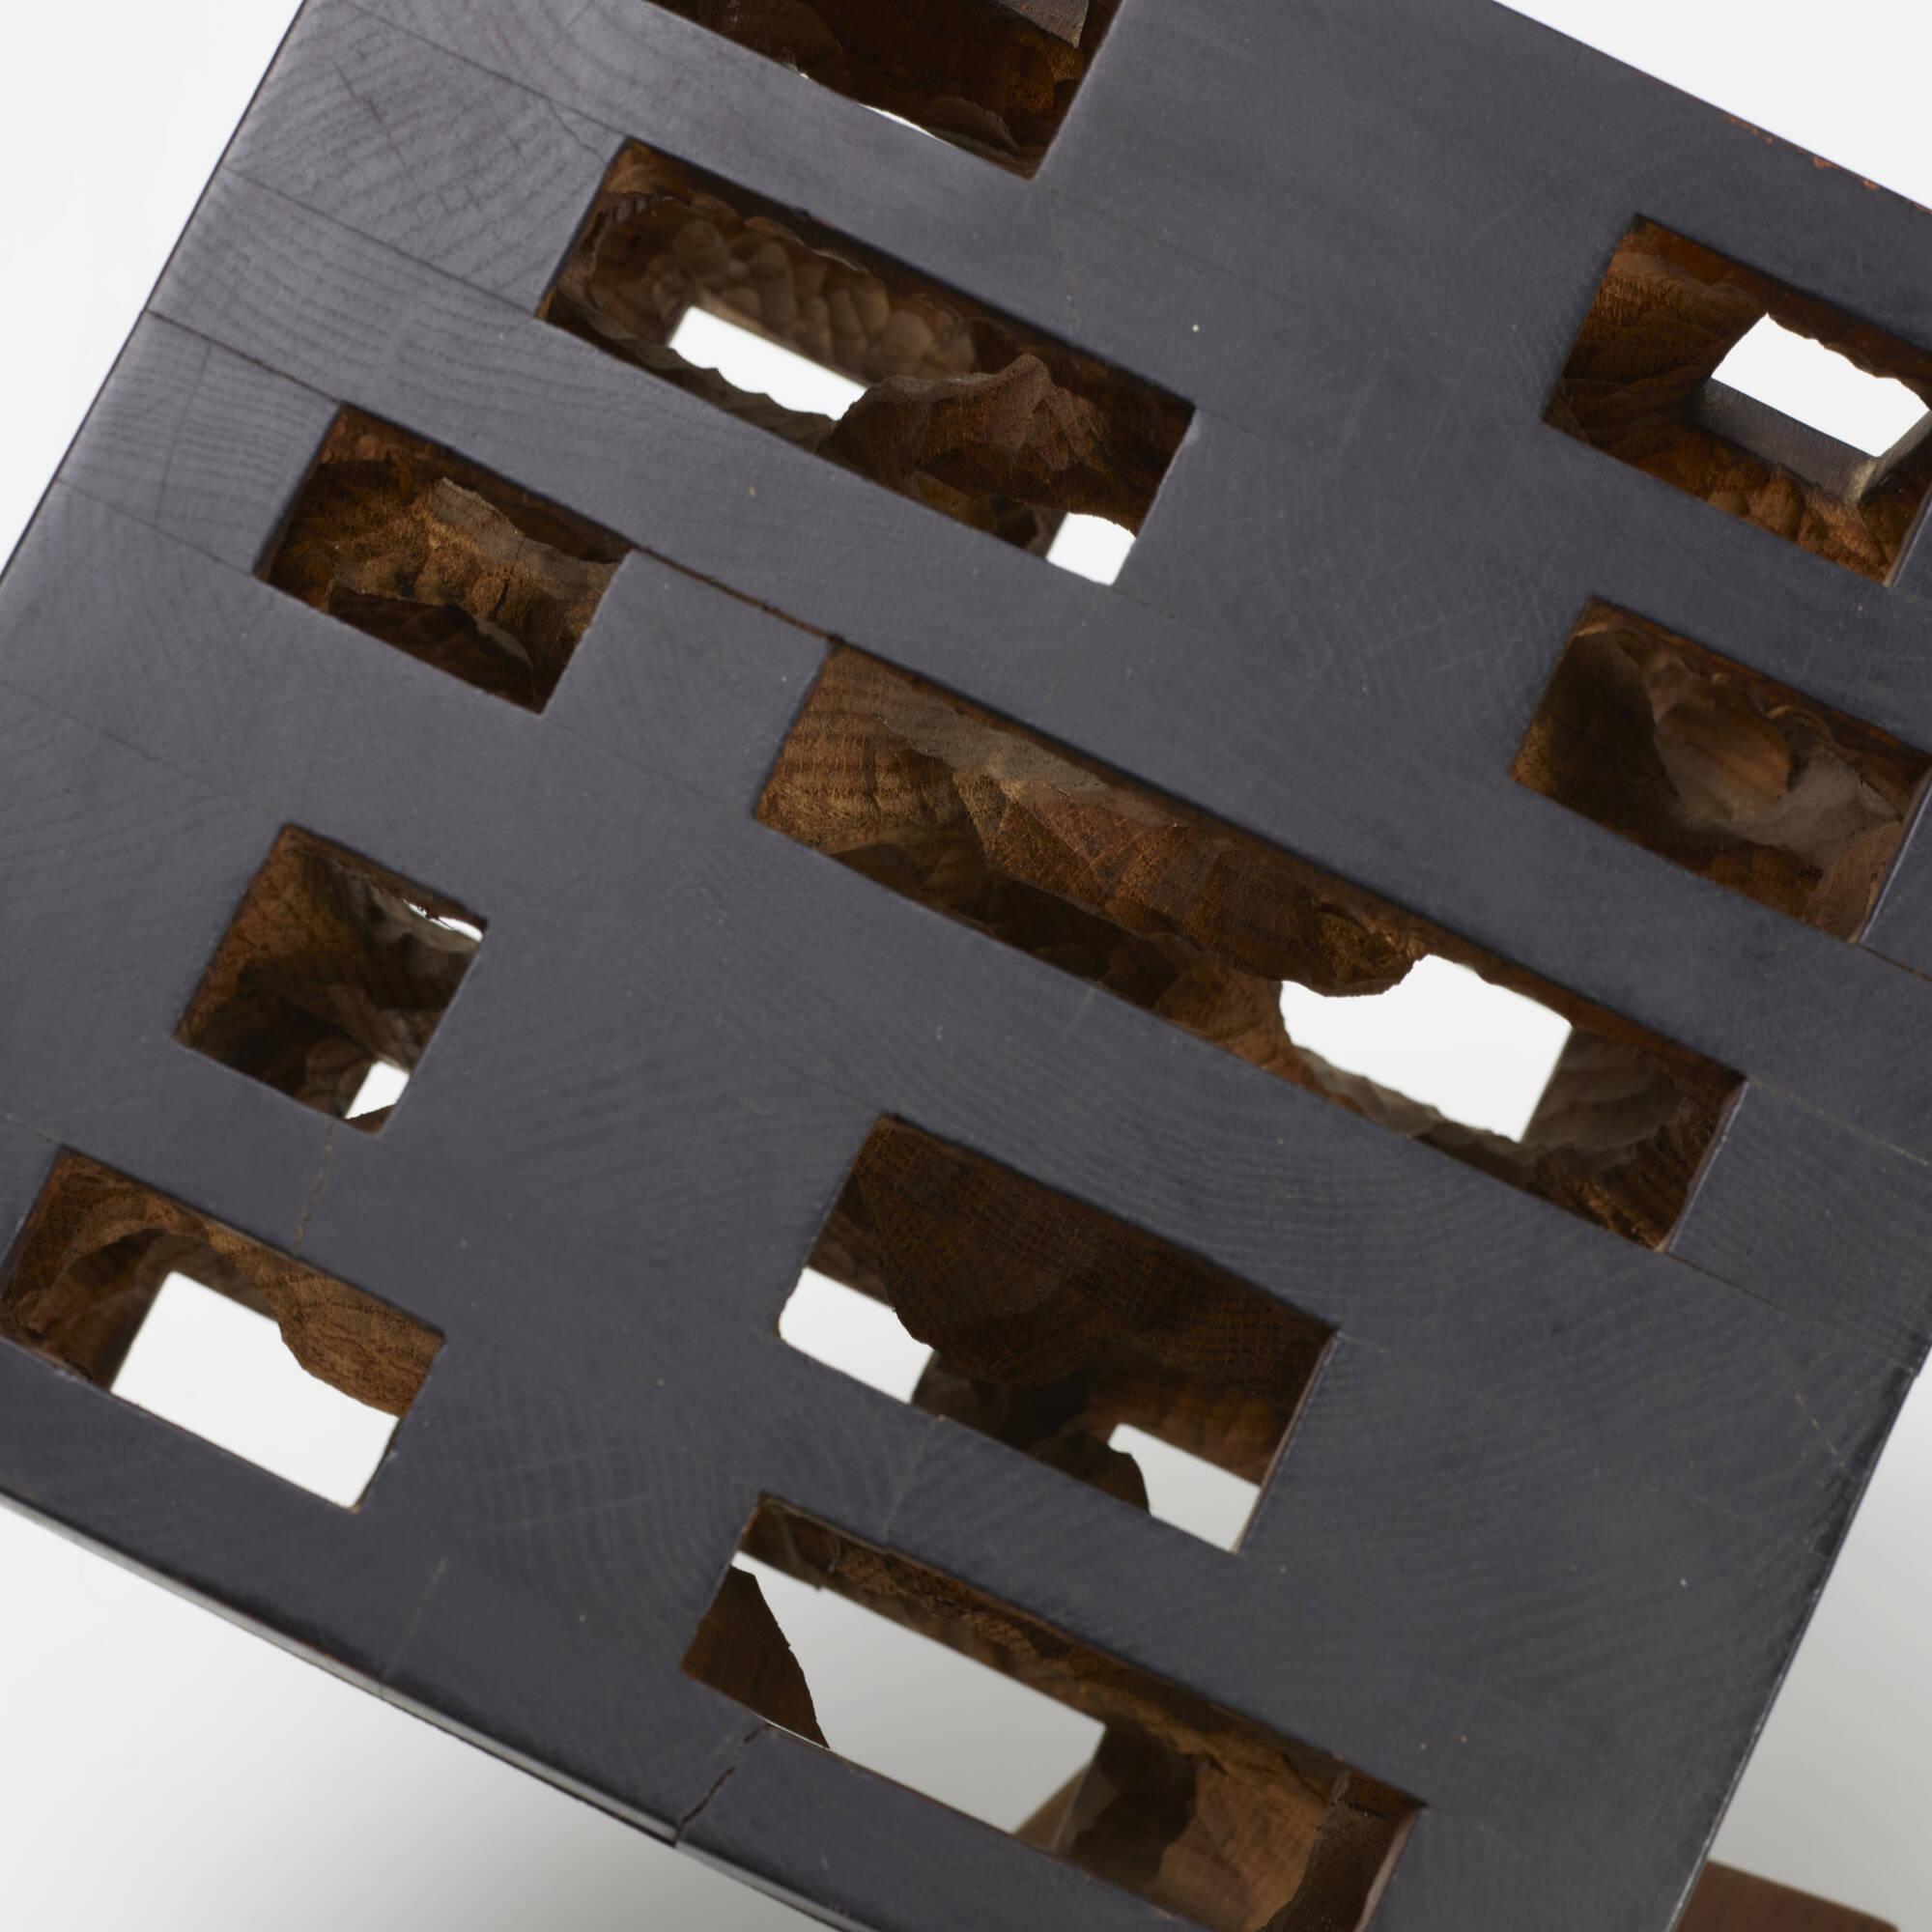 369: Mario Dal Fabbro / Untitled (2 of 3)